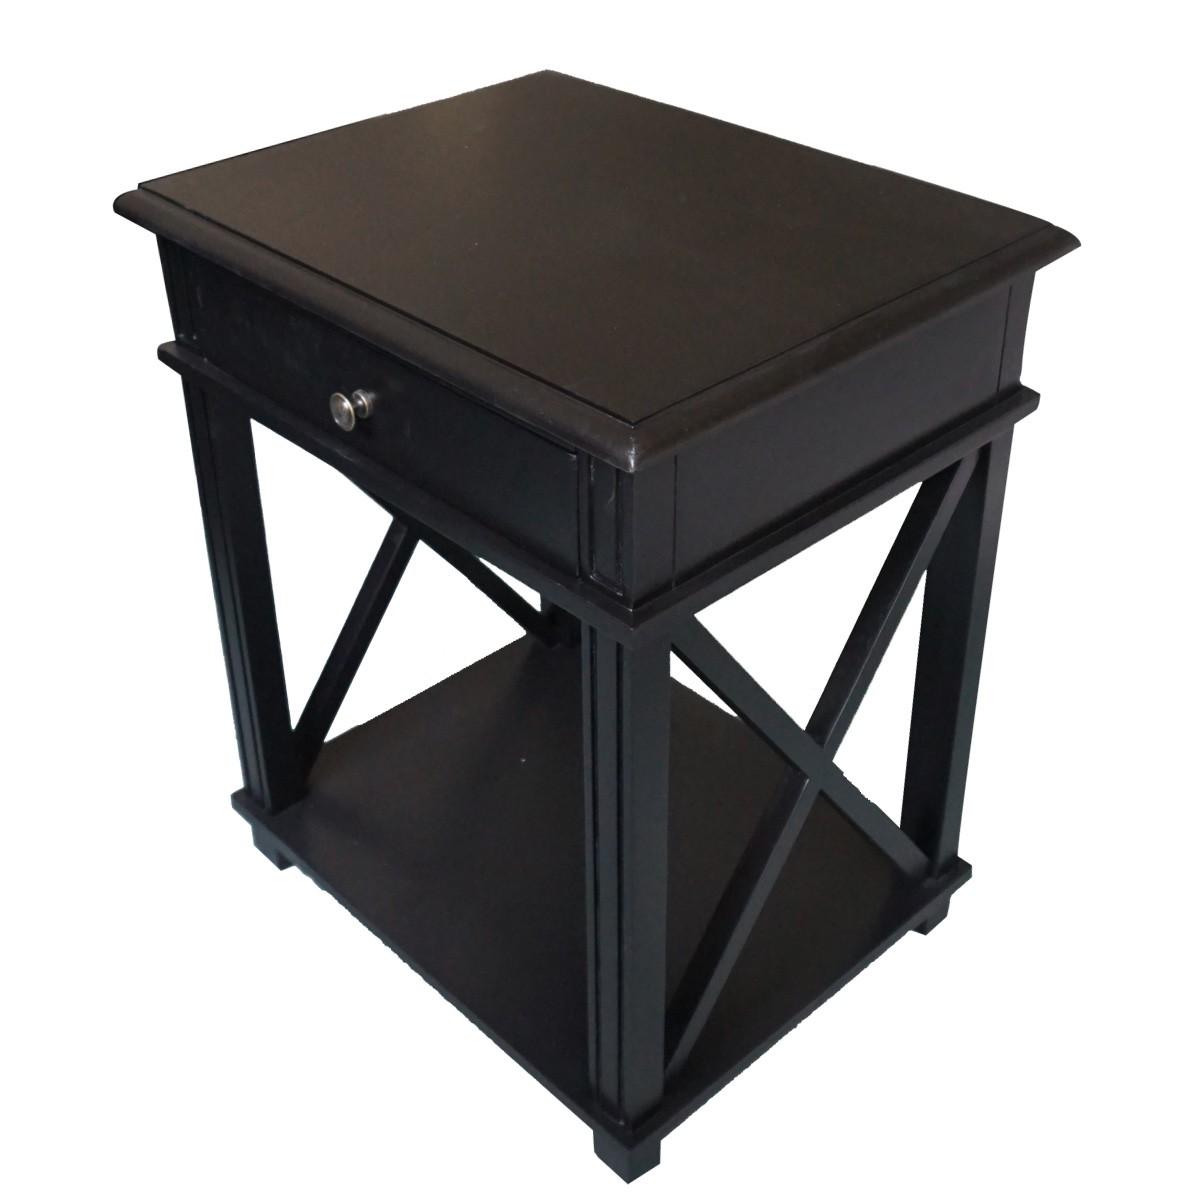 Hamptons Halifax One Drawer Bedside Lamp Table Nightstand Villa Black